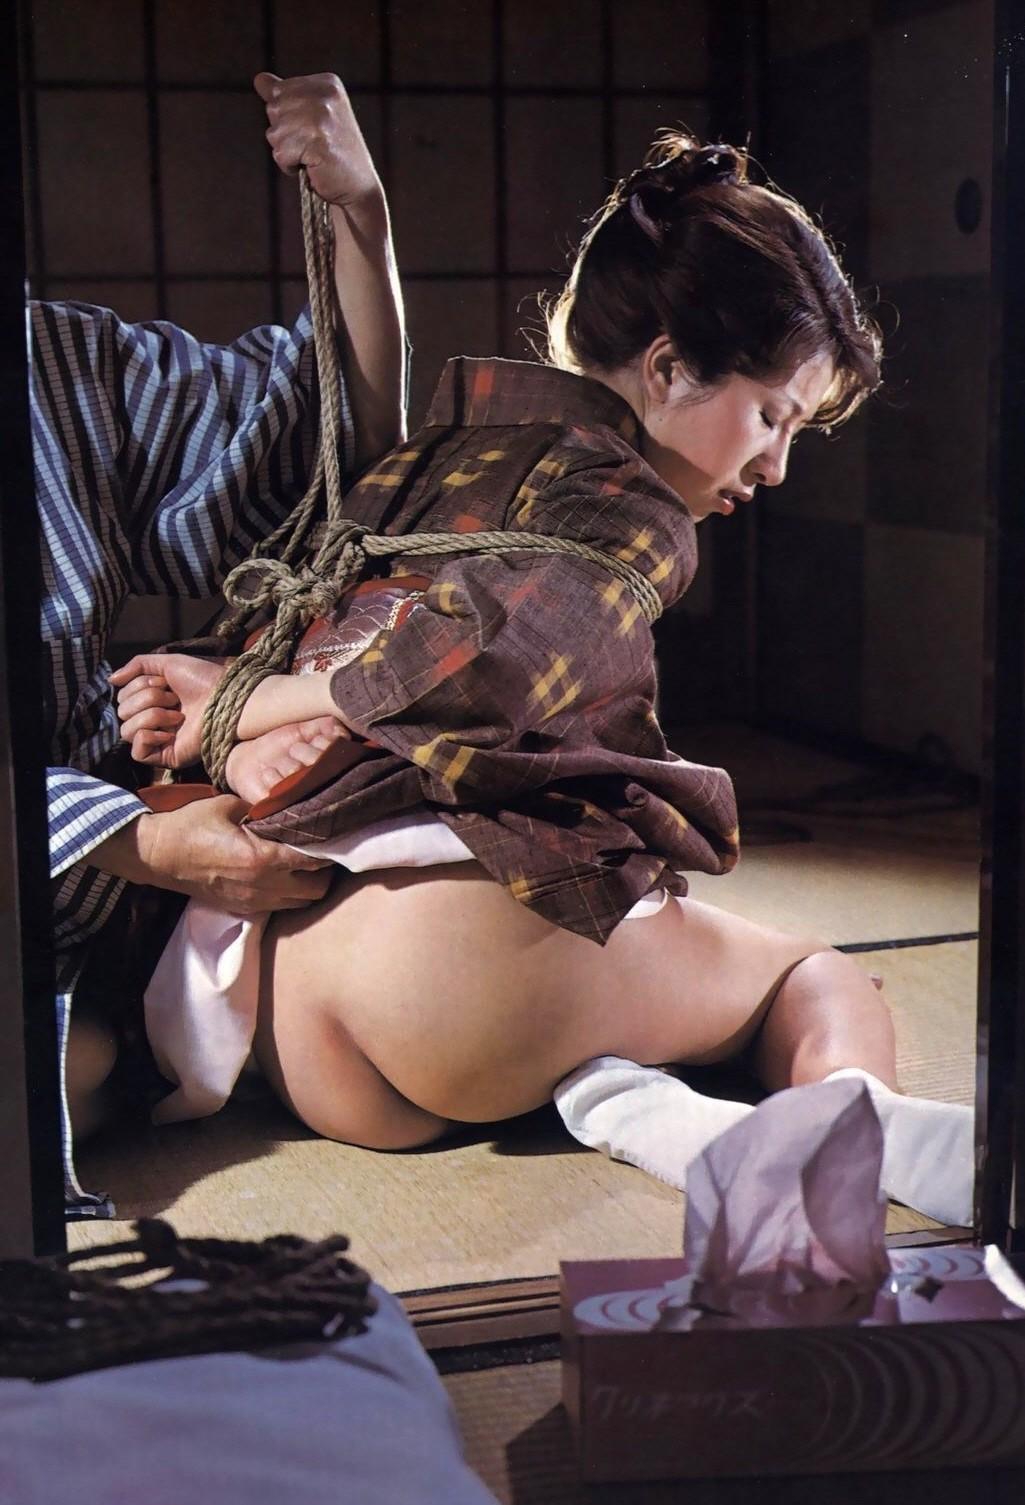 【SMエロ画像】昔の拷問っぽくて酷w着物姿の女性を緊縛して徹底調教www 05